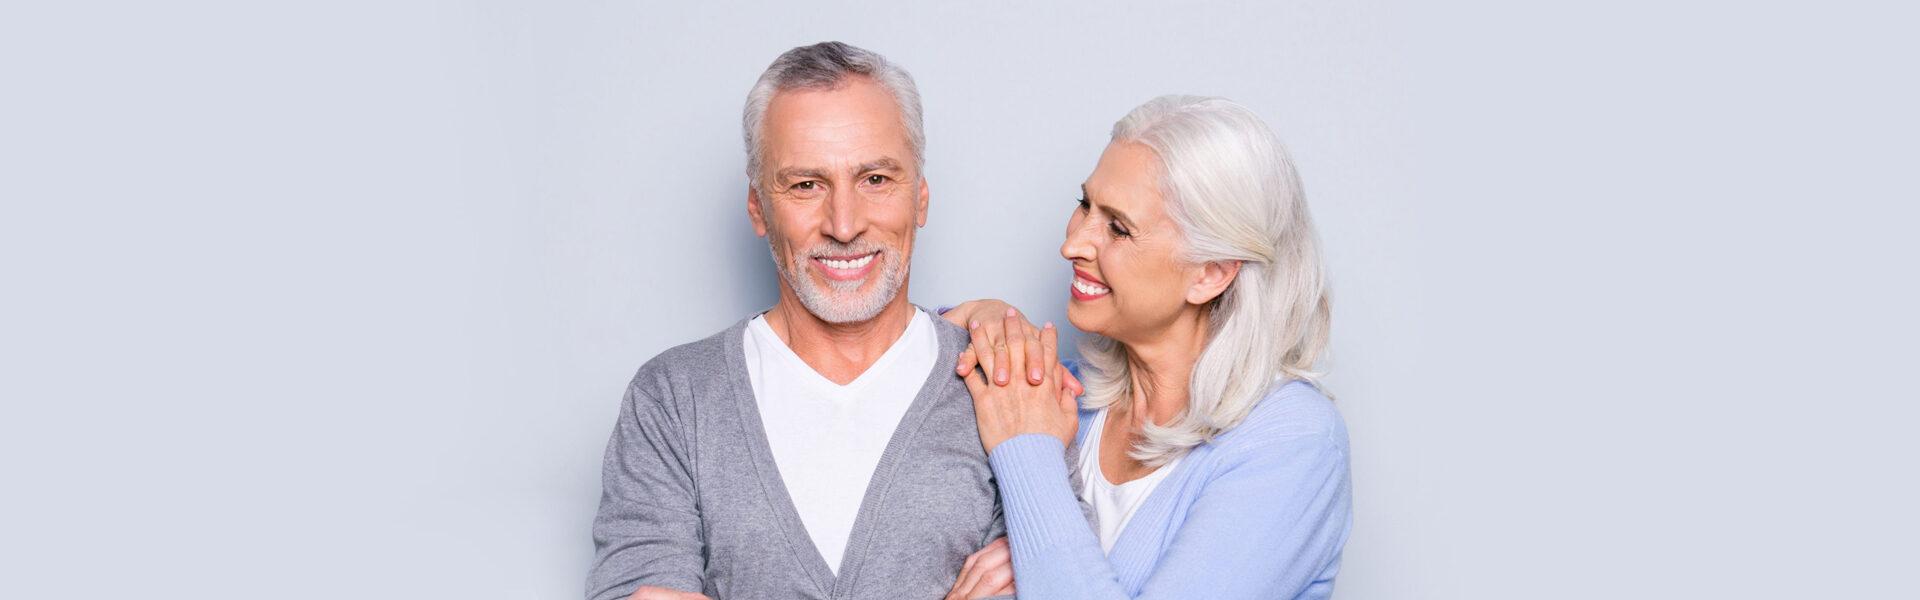 Dental Implant Restorations in Westwood, MA